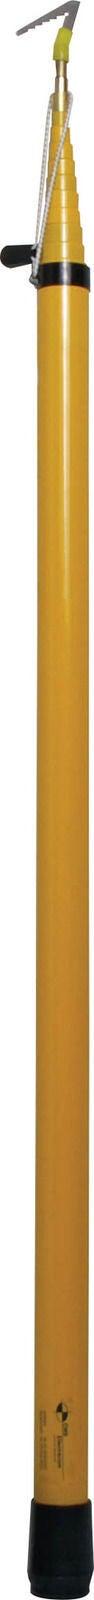 Telescopic Cable Grab Lightweight Fiberglass TCGP48 4.8m TP16 Collapsing Pole T4640